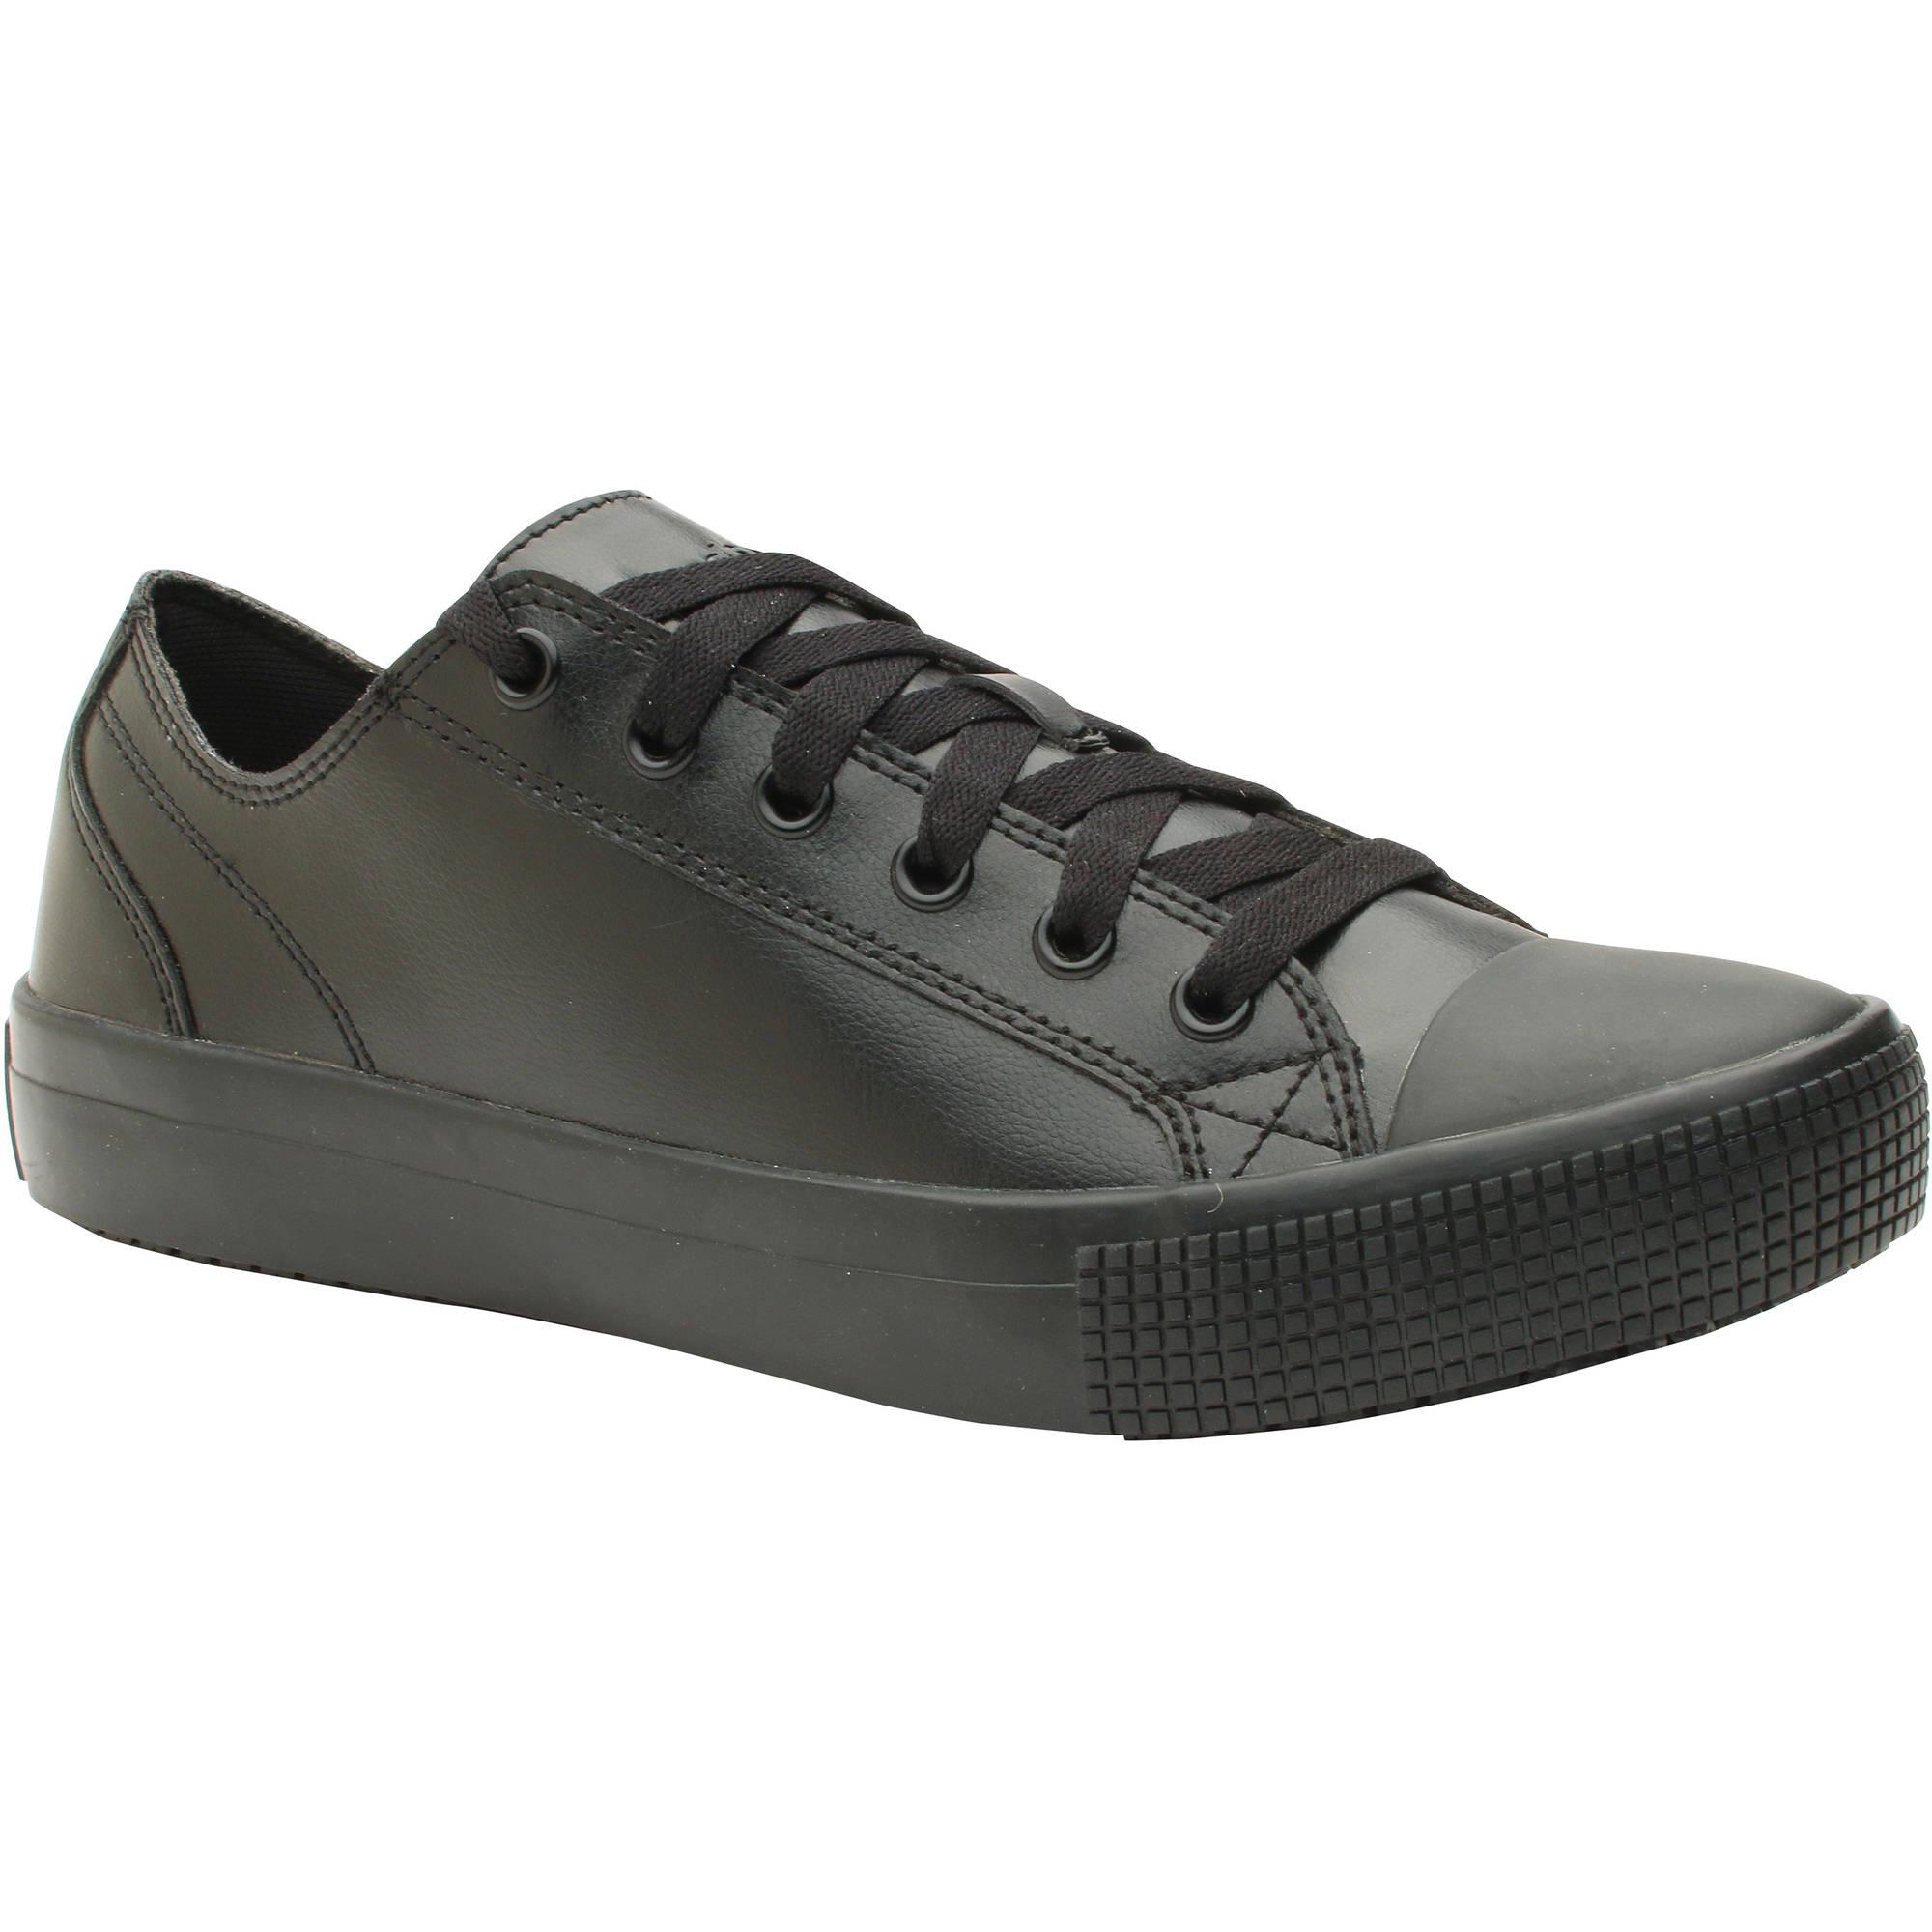 kitchen safe shoes cutler and bath vanity tredsafe men s executive ii slip resistant work shoe walmart com